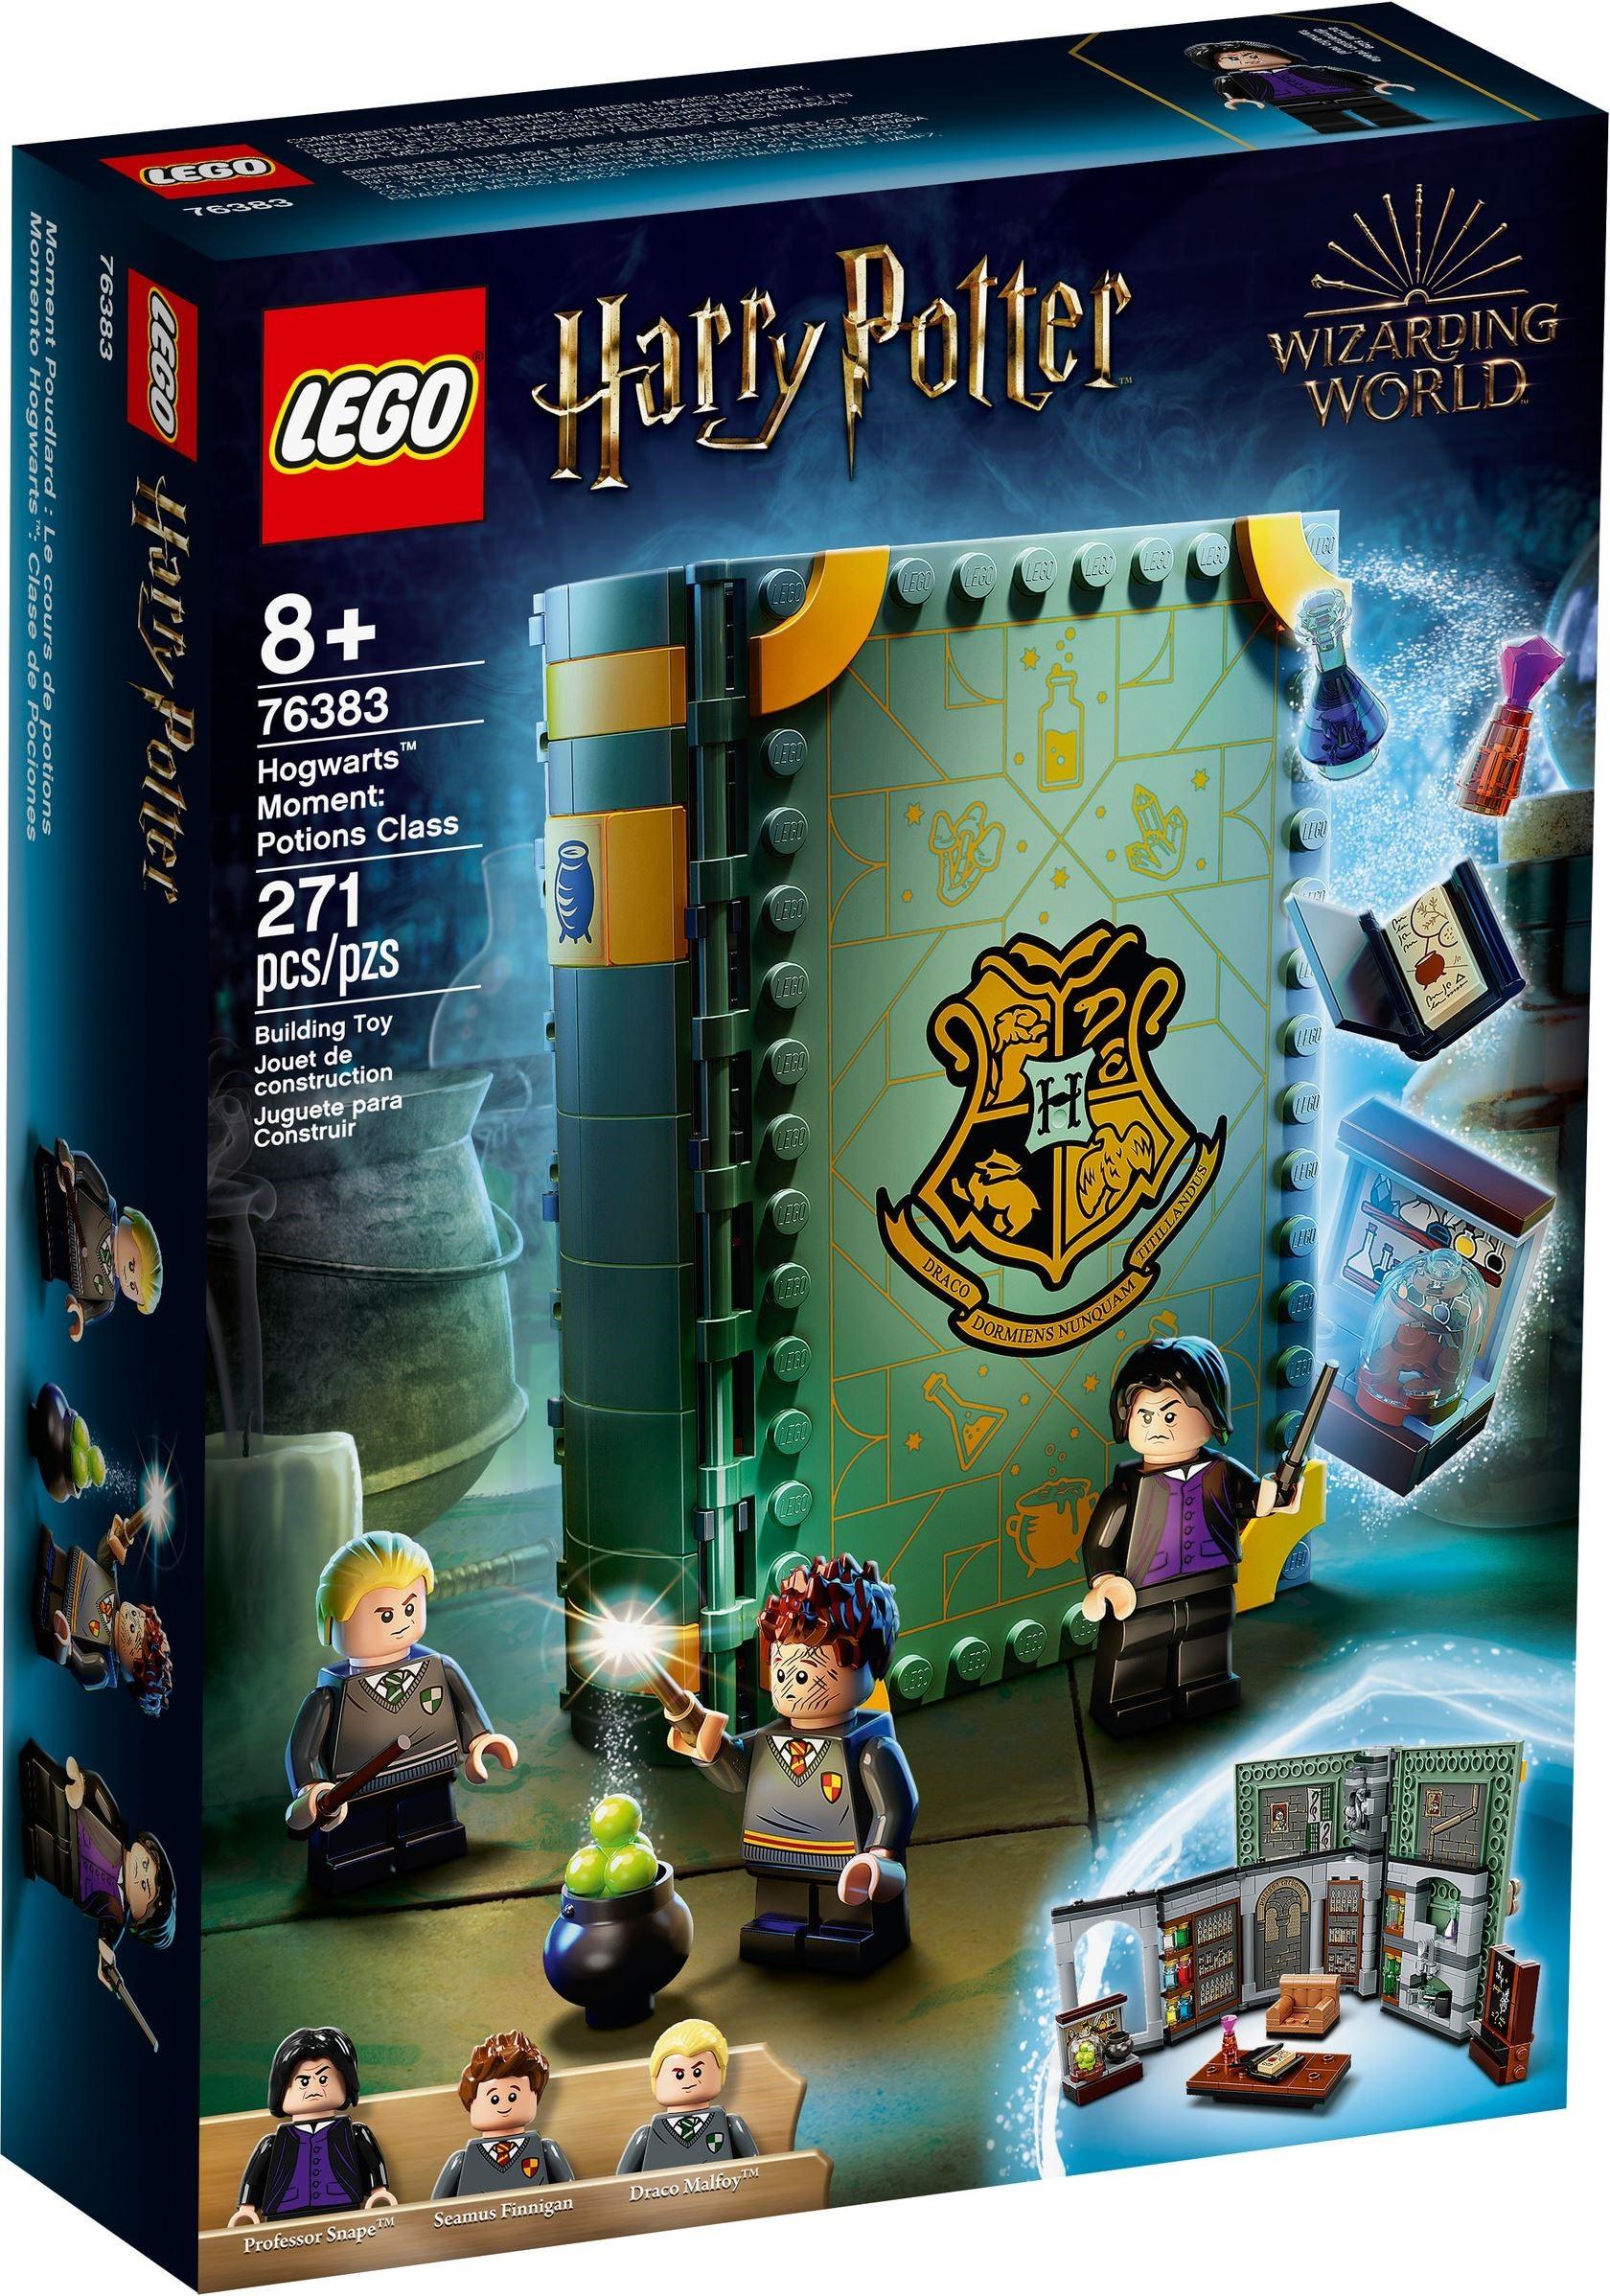 LEGO Harry Potter - Hogwarts™ Moment: Potions Class (76383)